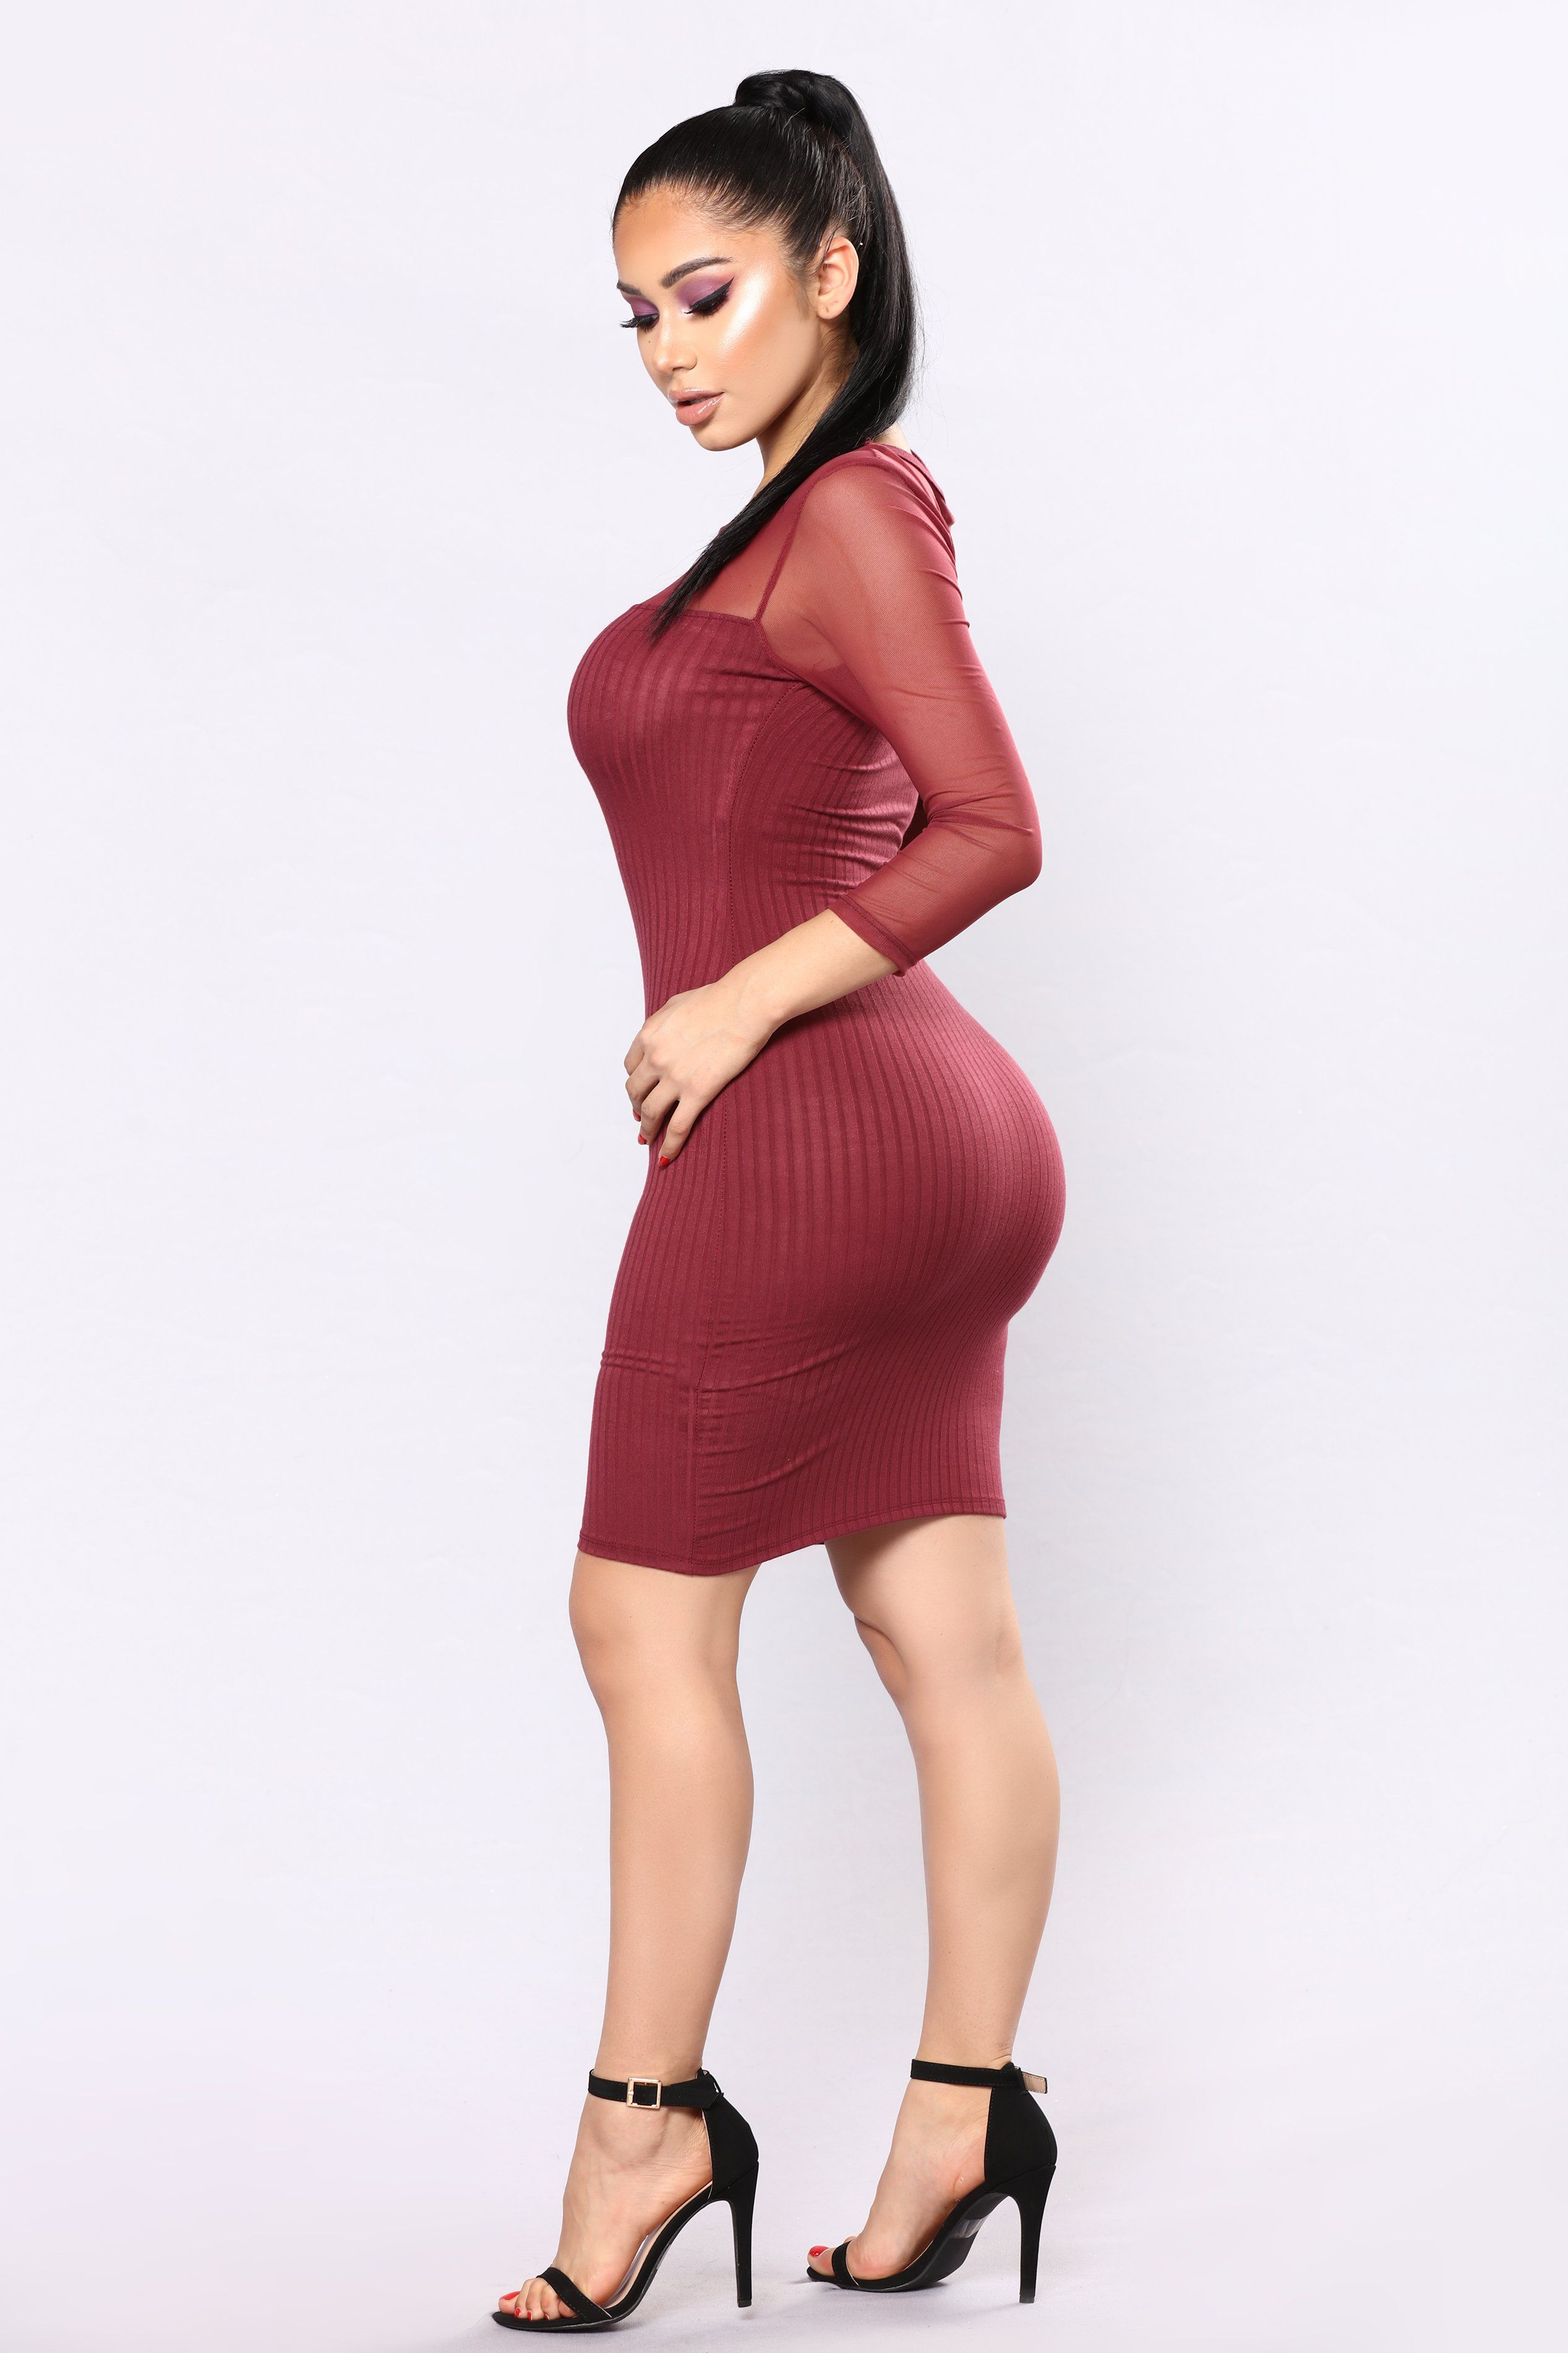 Gianna mesh dress wine mesh dress mauve and curves